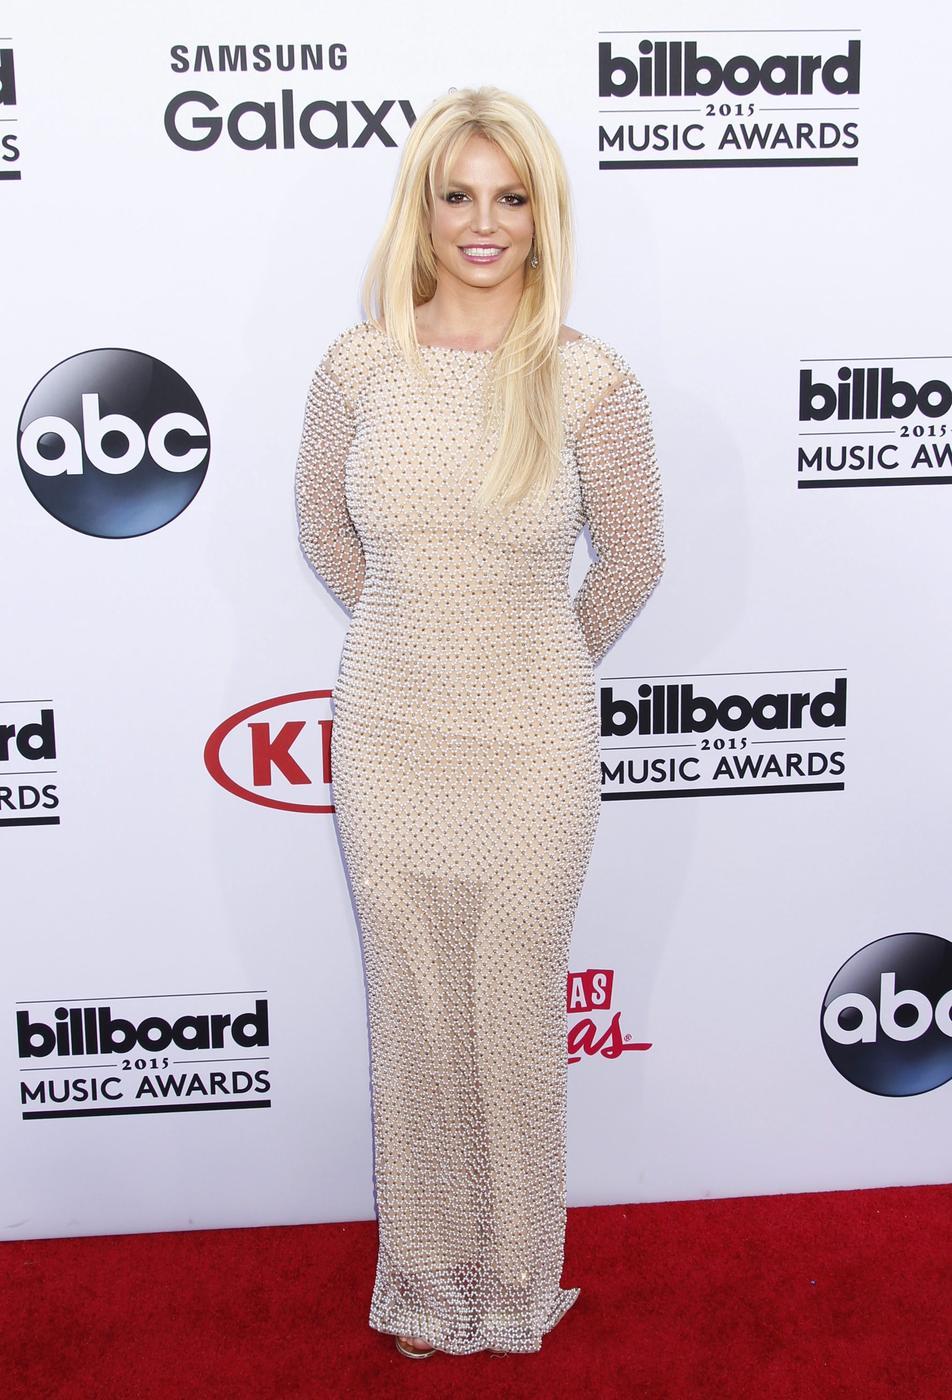 Billboard Music Awards - arrivals EPA/JIMMY MORRIS